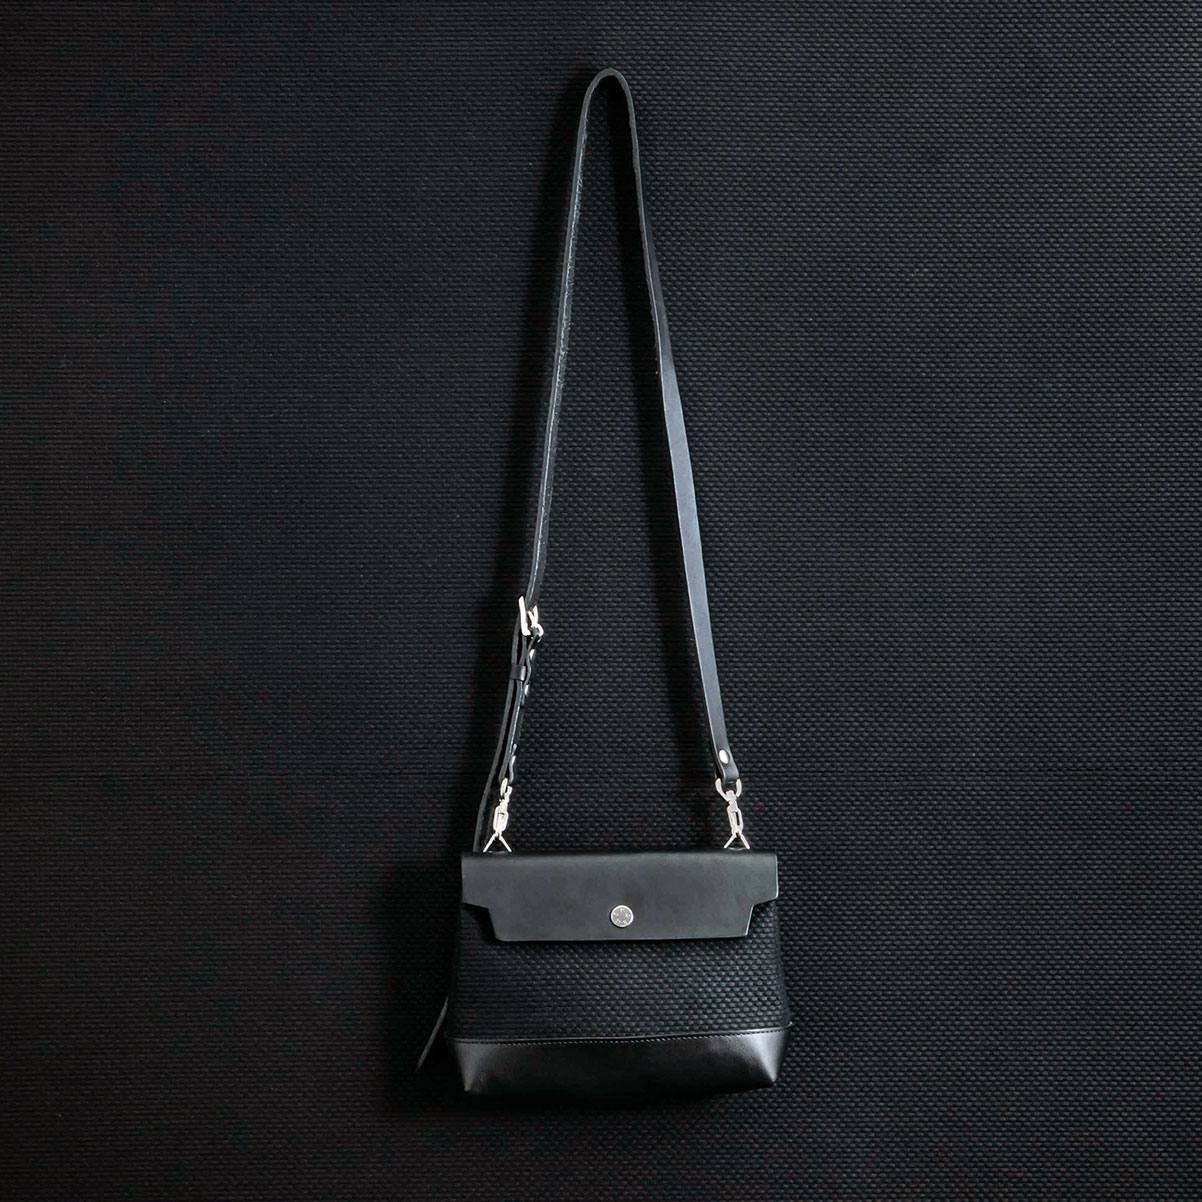 N°59-plus Micro Shoulder small